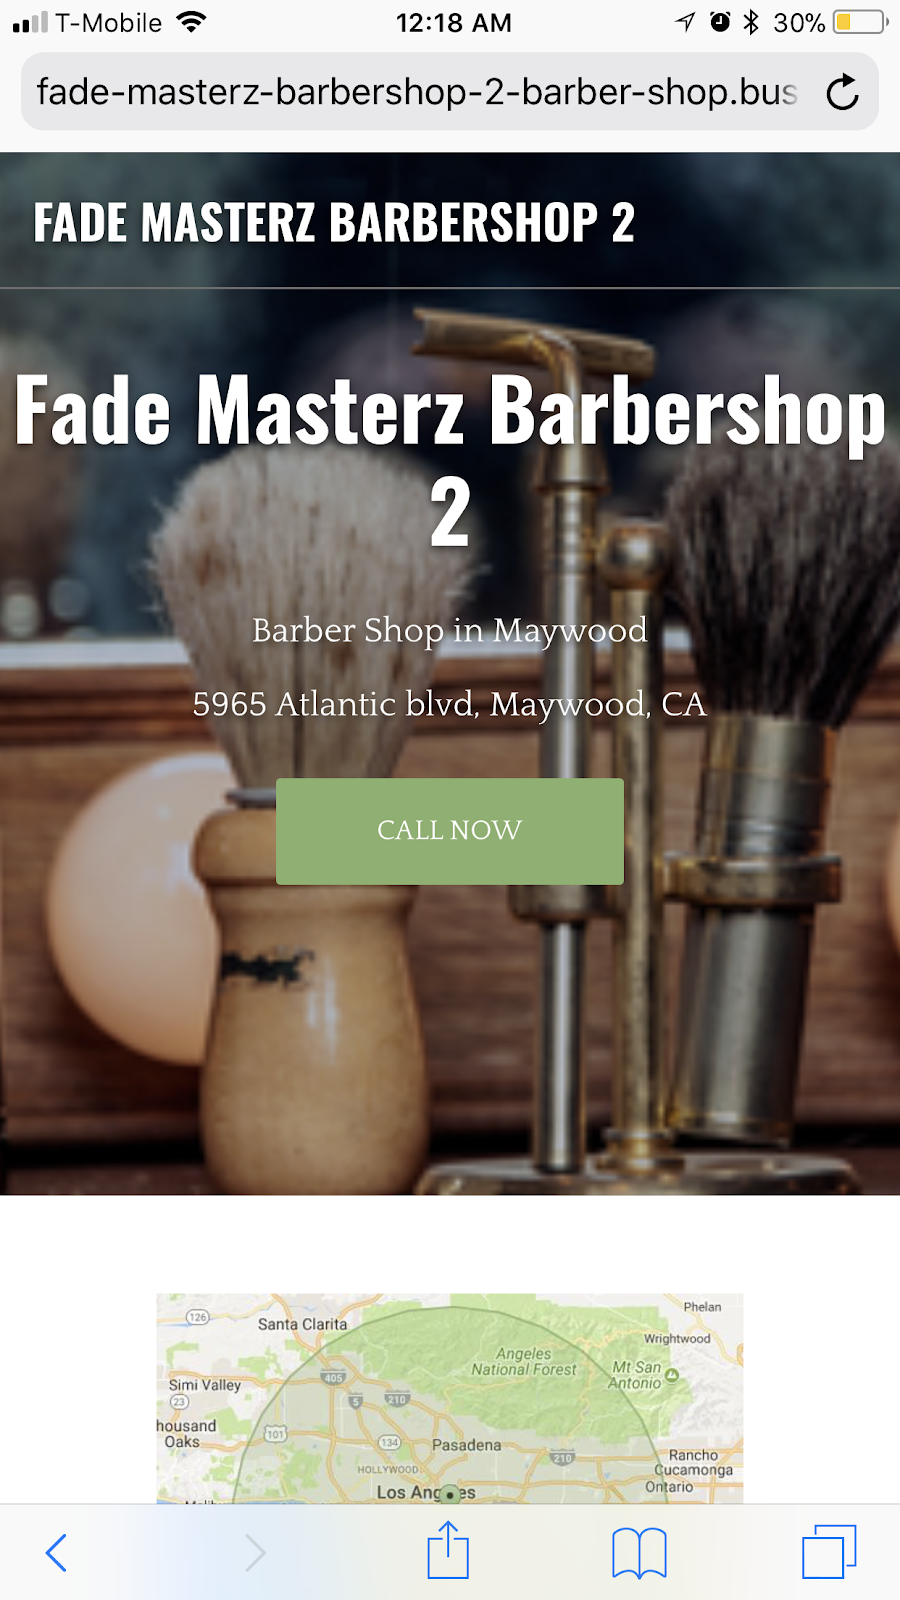 Fade Masterz Barbershop - hair care  | Photo 4 of 10 | Address: 4027 S Main St, Los Angeles, CA 90037, USA | Phone: (323) 474-1867